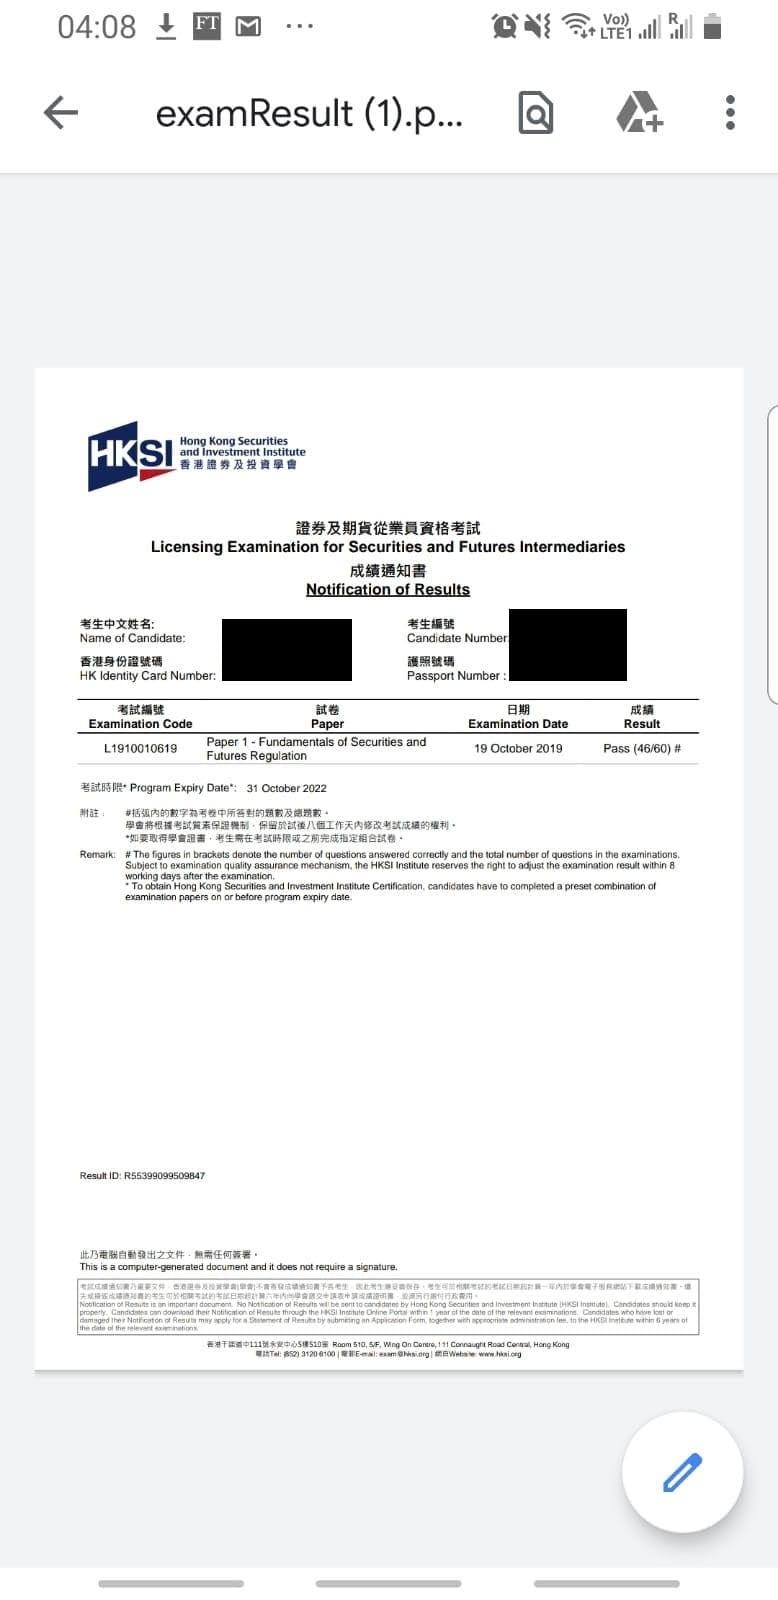 DSV 19/10/2019 LE Paper 1 證券期貨從業員資格考試卷一 Pass